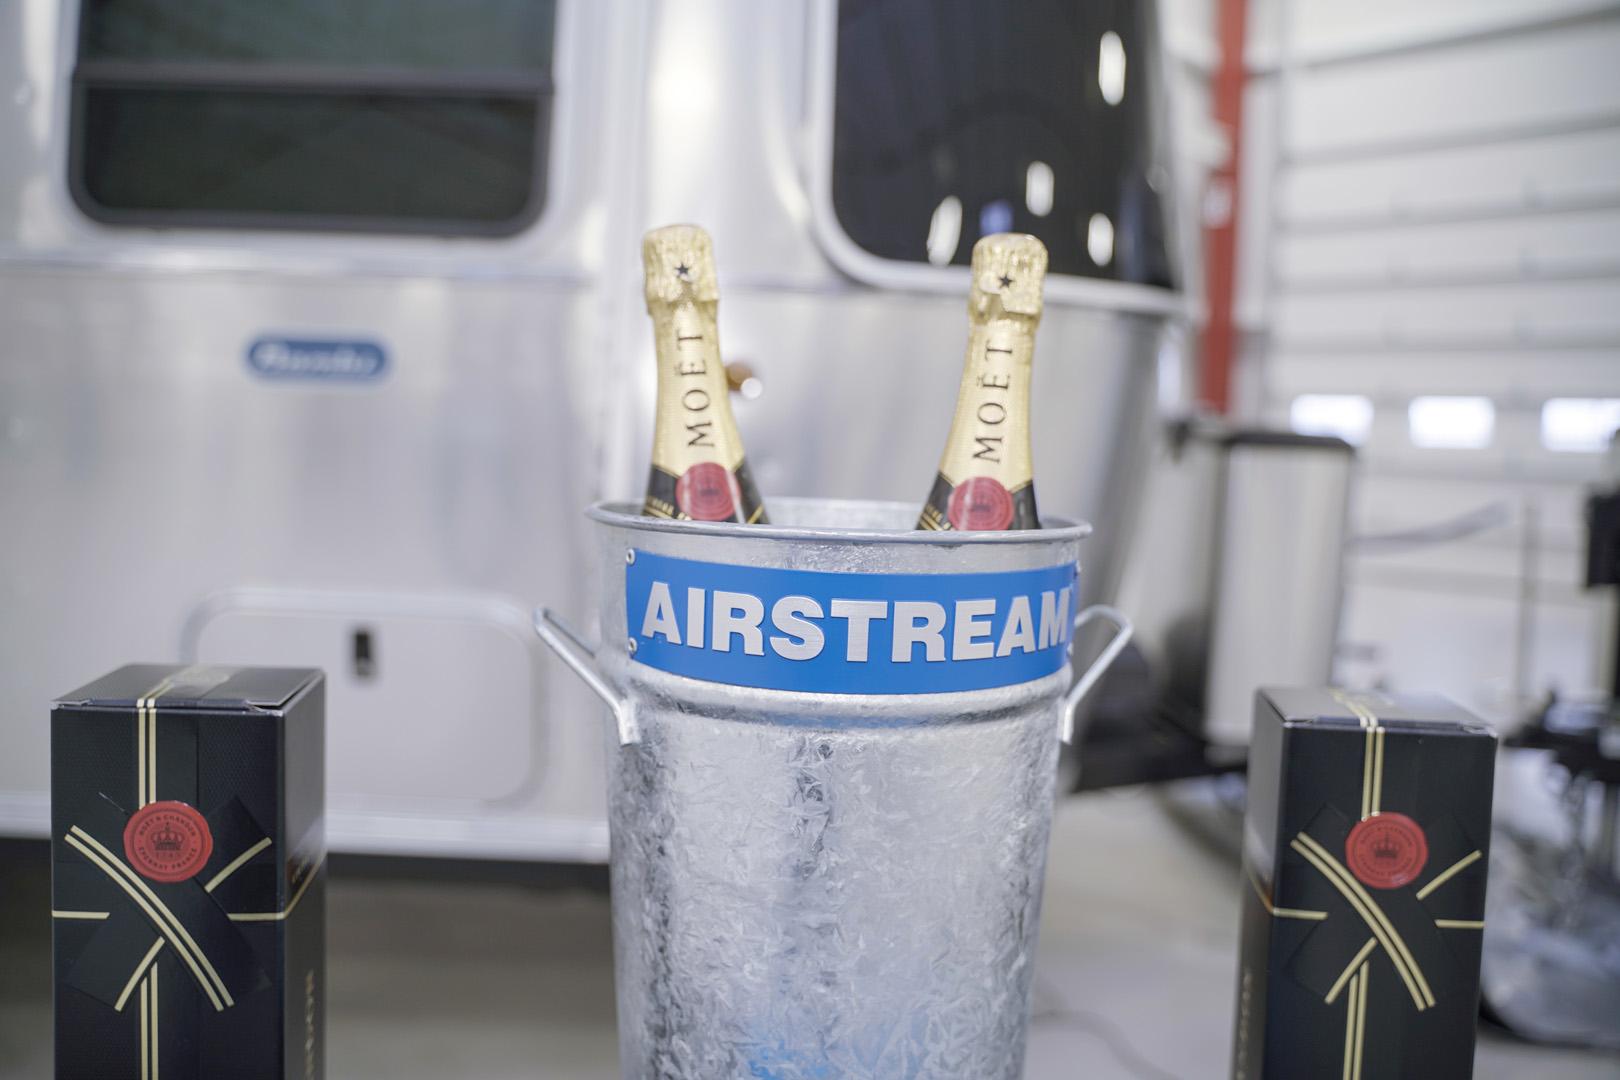 Airstream Christening Ceremony Champagne